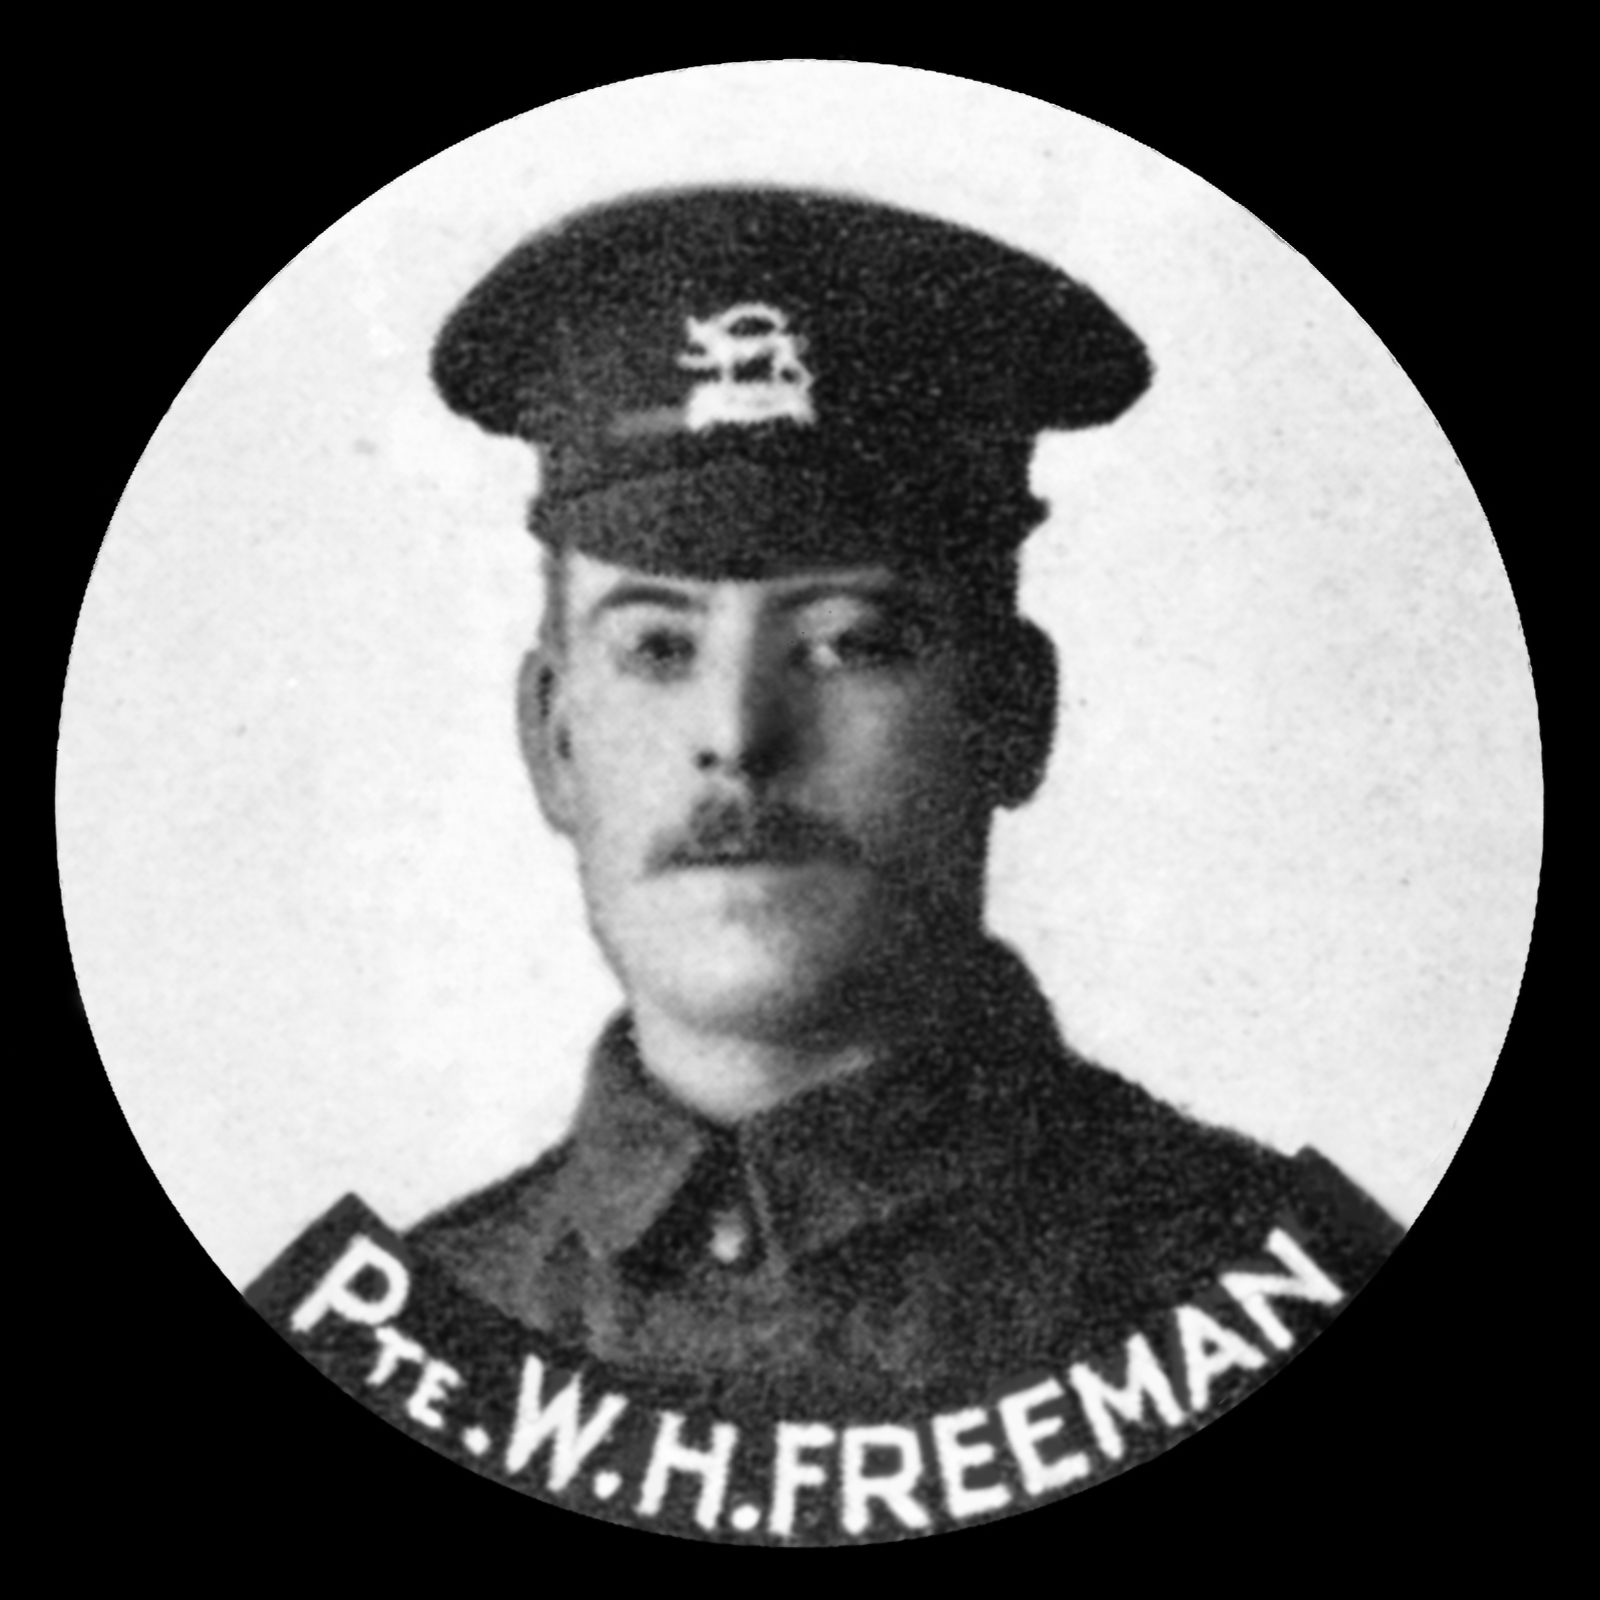 FREEMAN William Henry